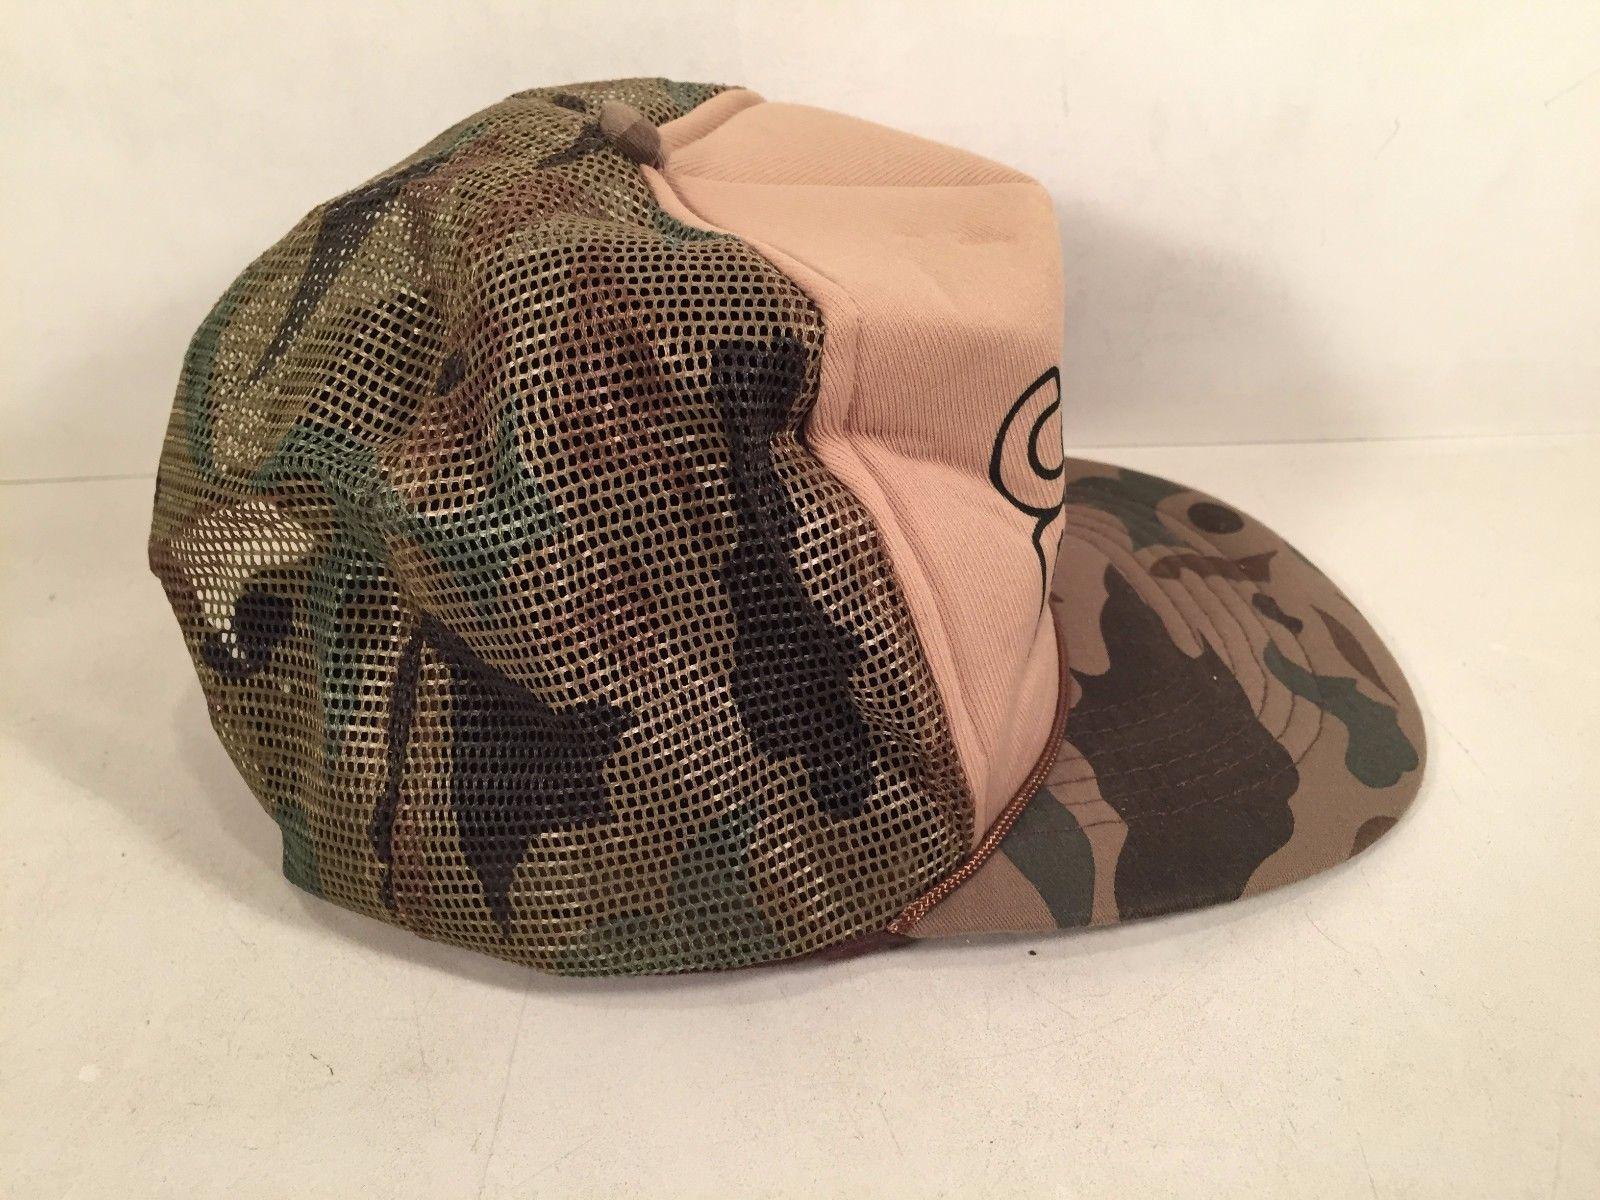 CACTUS PETE'S TRUCKER'S CAMO HAT BASEBALL CAP